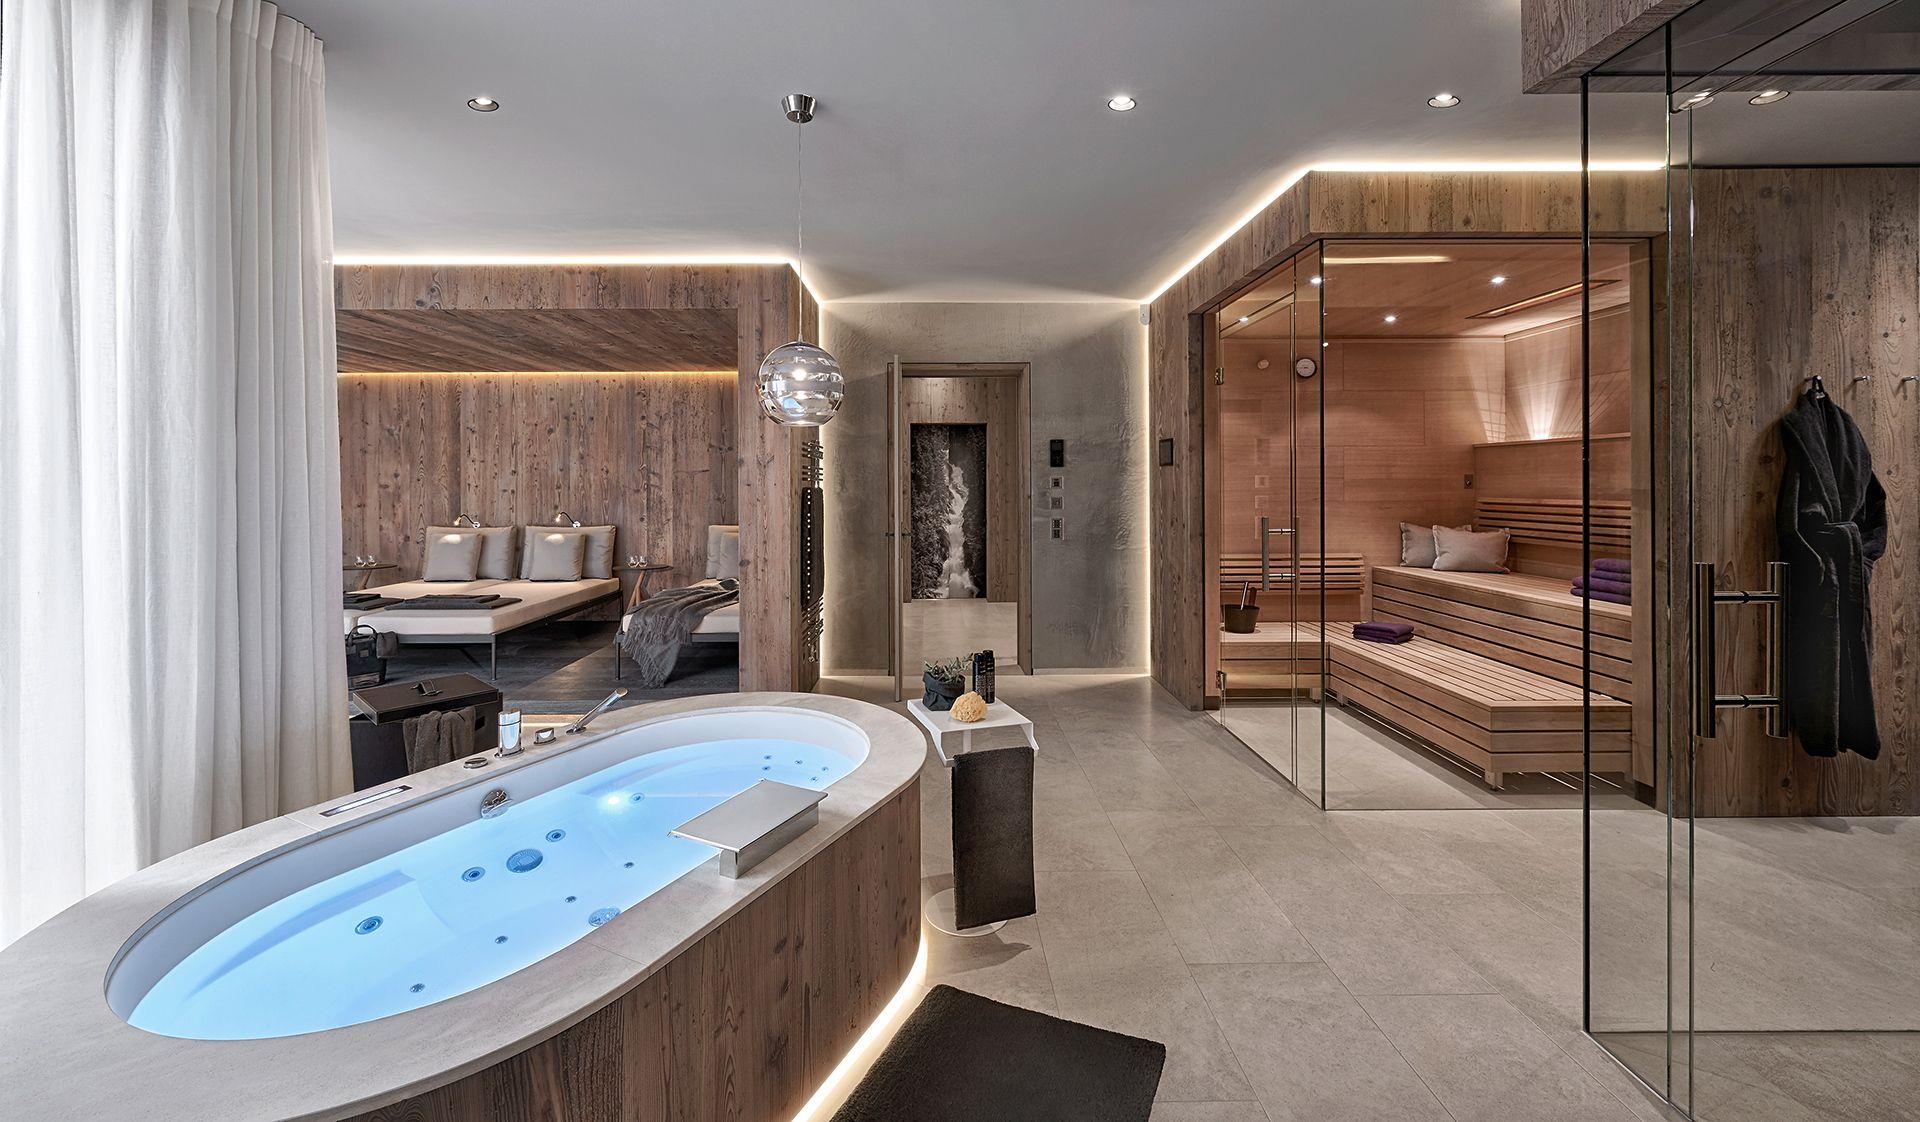 Kitzbuhel Exklusive Einblicke Kurmittelhaus Modernes Badezimmerdesign Luxusbadezimmer